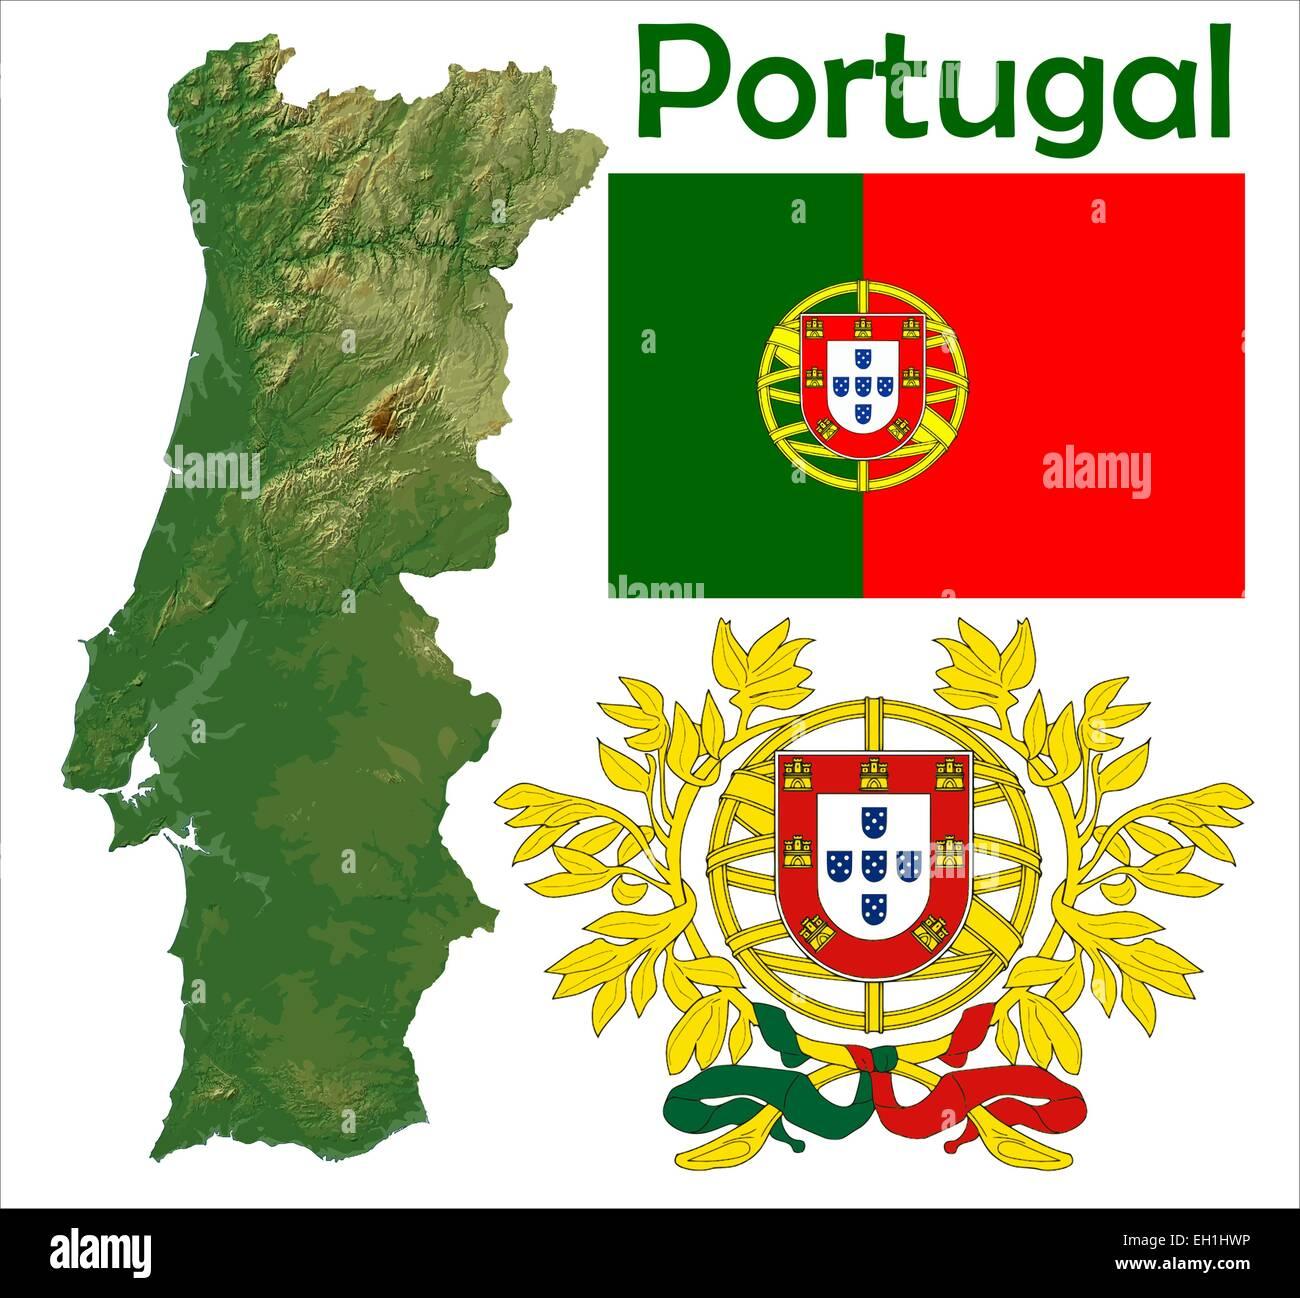 Portugal Map Flag Coat Stock Vector Art Illustration Vector - Portugal map flag